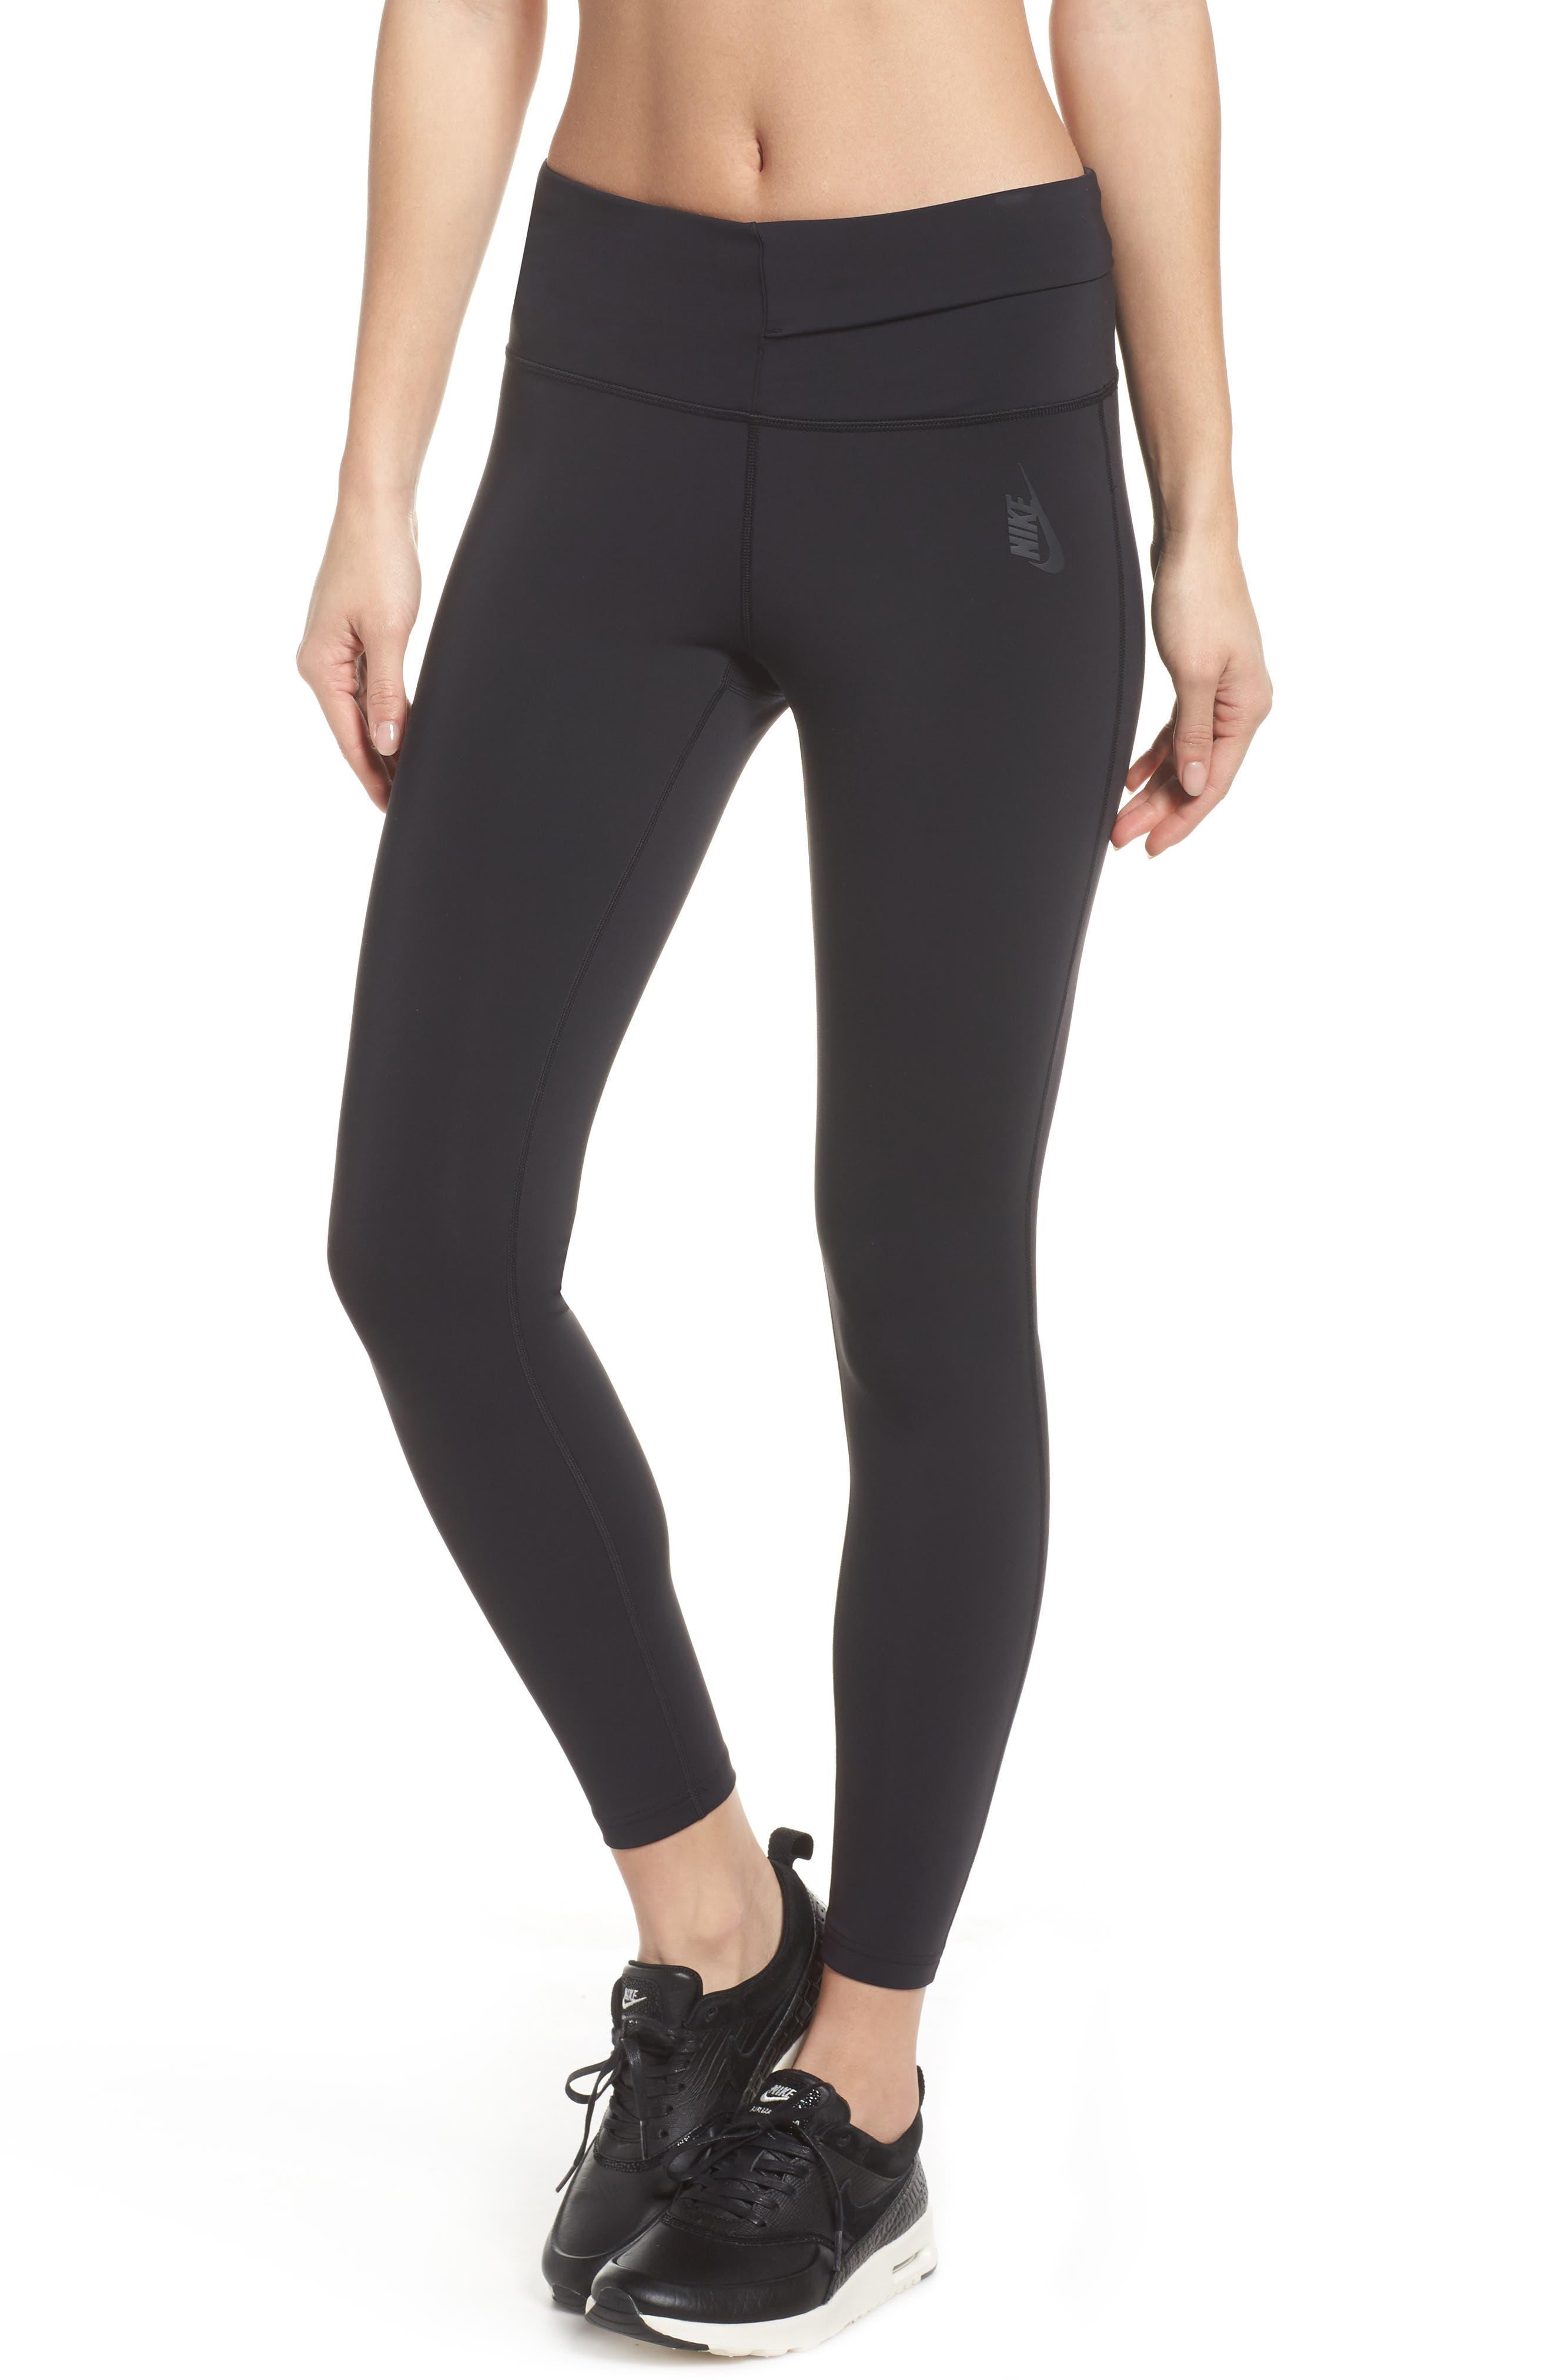 NikeLab Women's Tights,                             Main thumbnail 1, color,                             Black/ Black